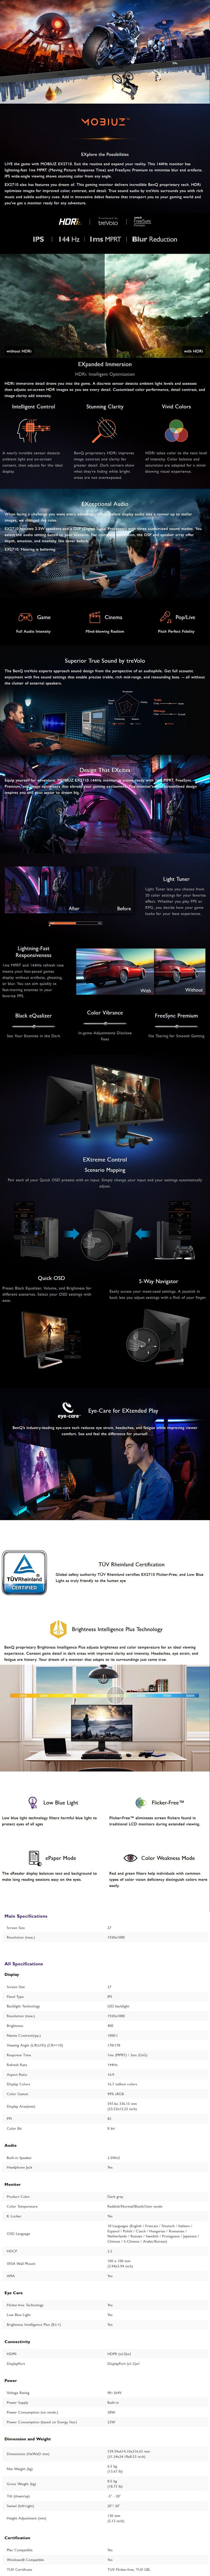 benq-ex2710-mobiuz-27-144hz-fhd-hdr-freesync-premium-ips-gaming-monitor-ac37305-8-1-.jpg